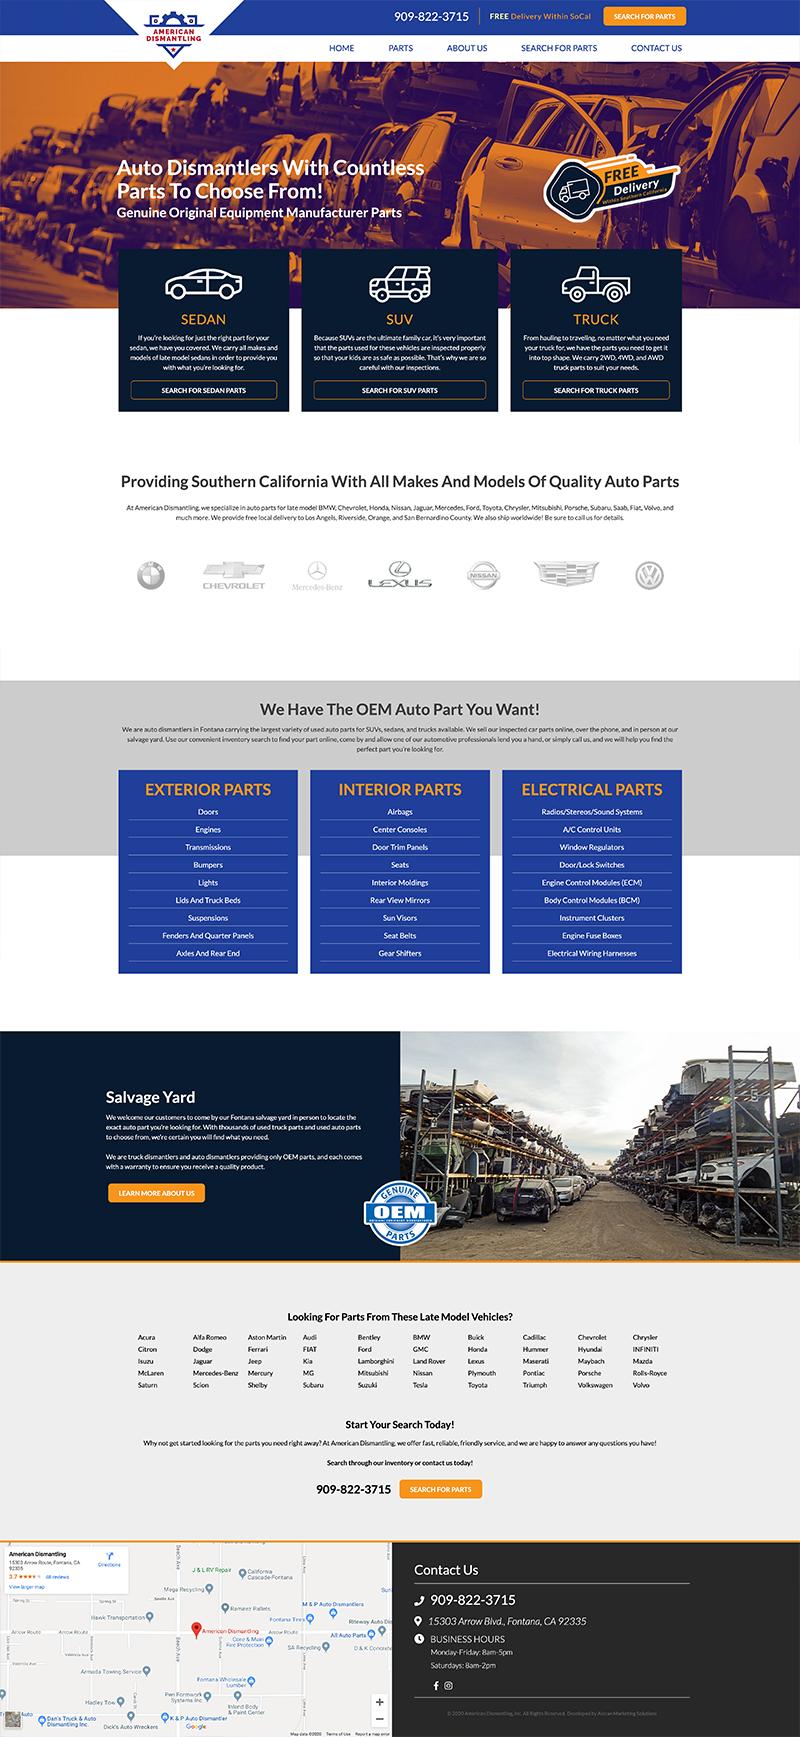 American Dismantling - Website